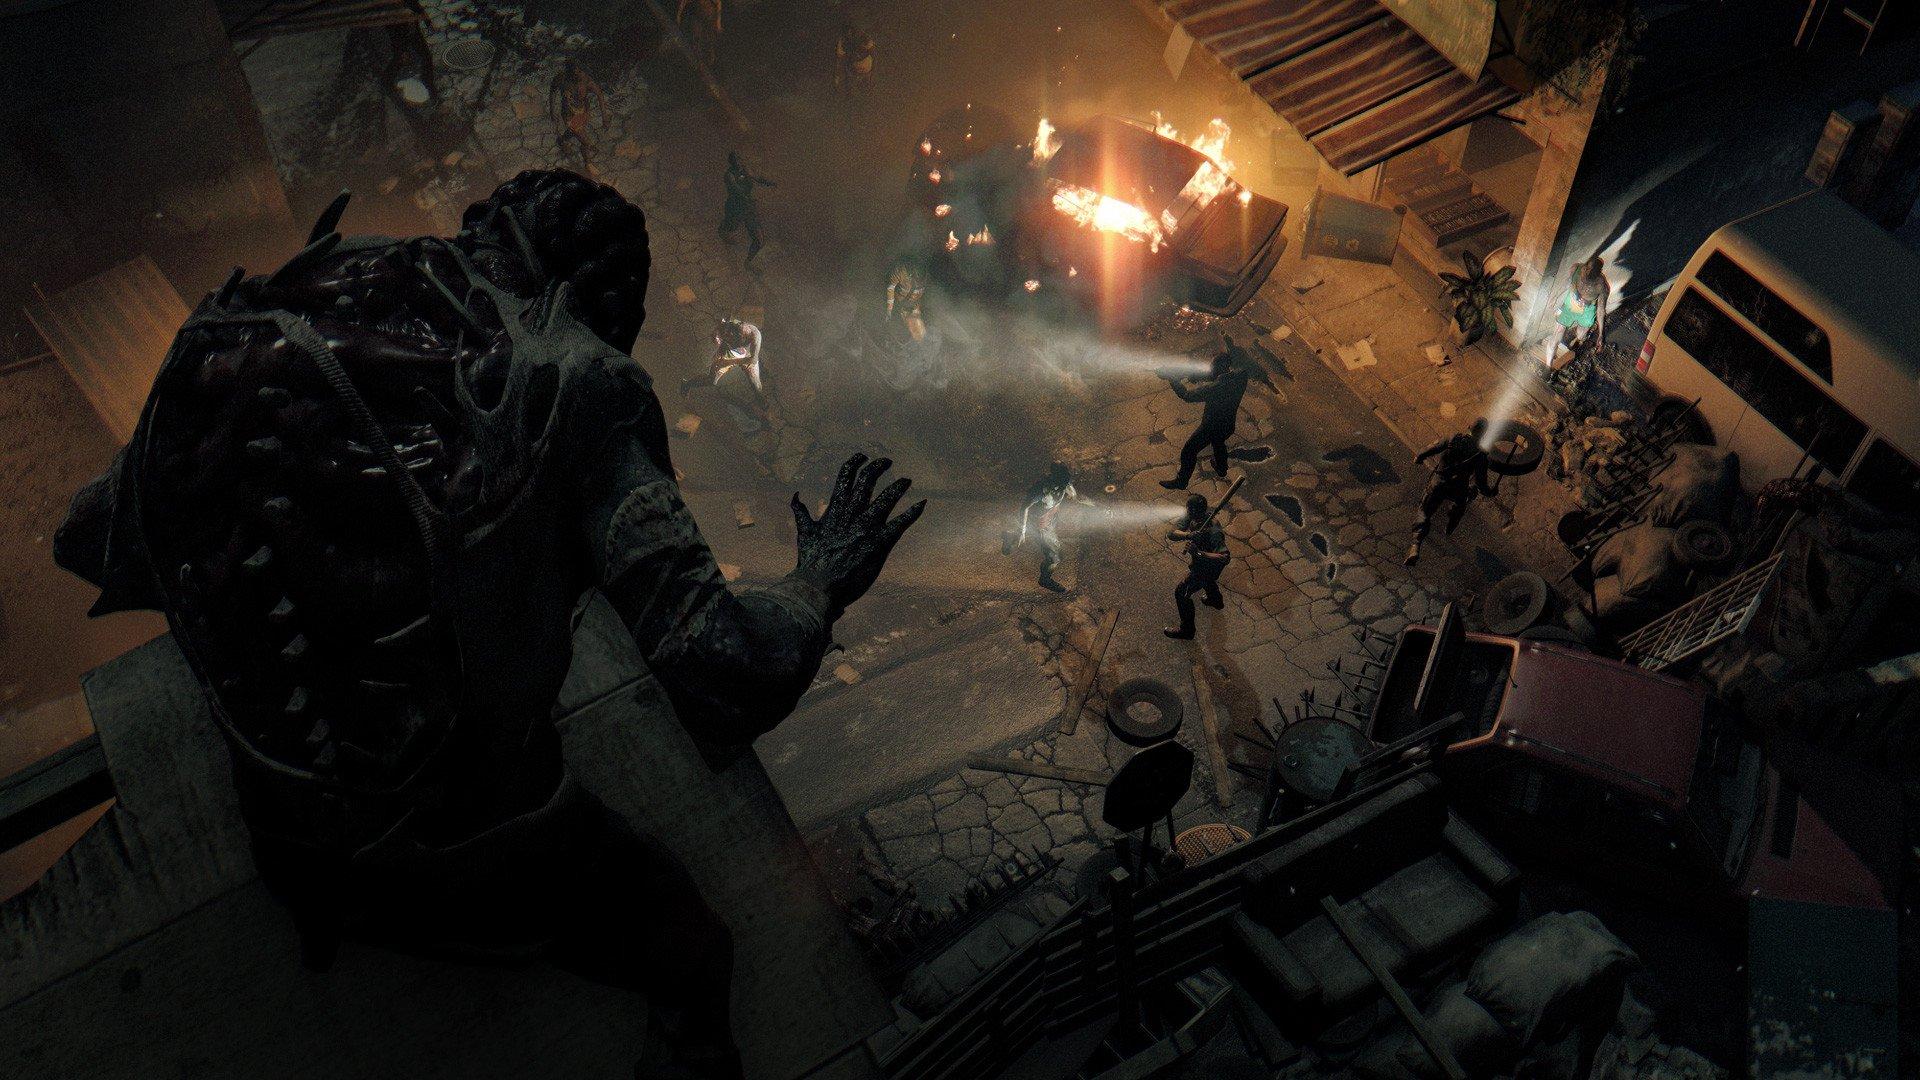 Dying Light - PC (XOne y PS4) - 3DJuegos.com